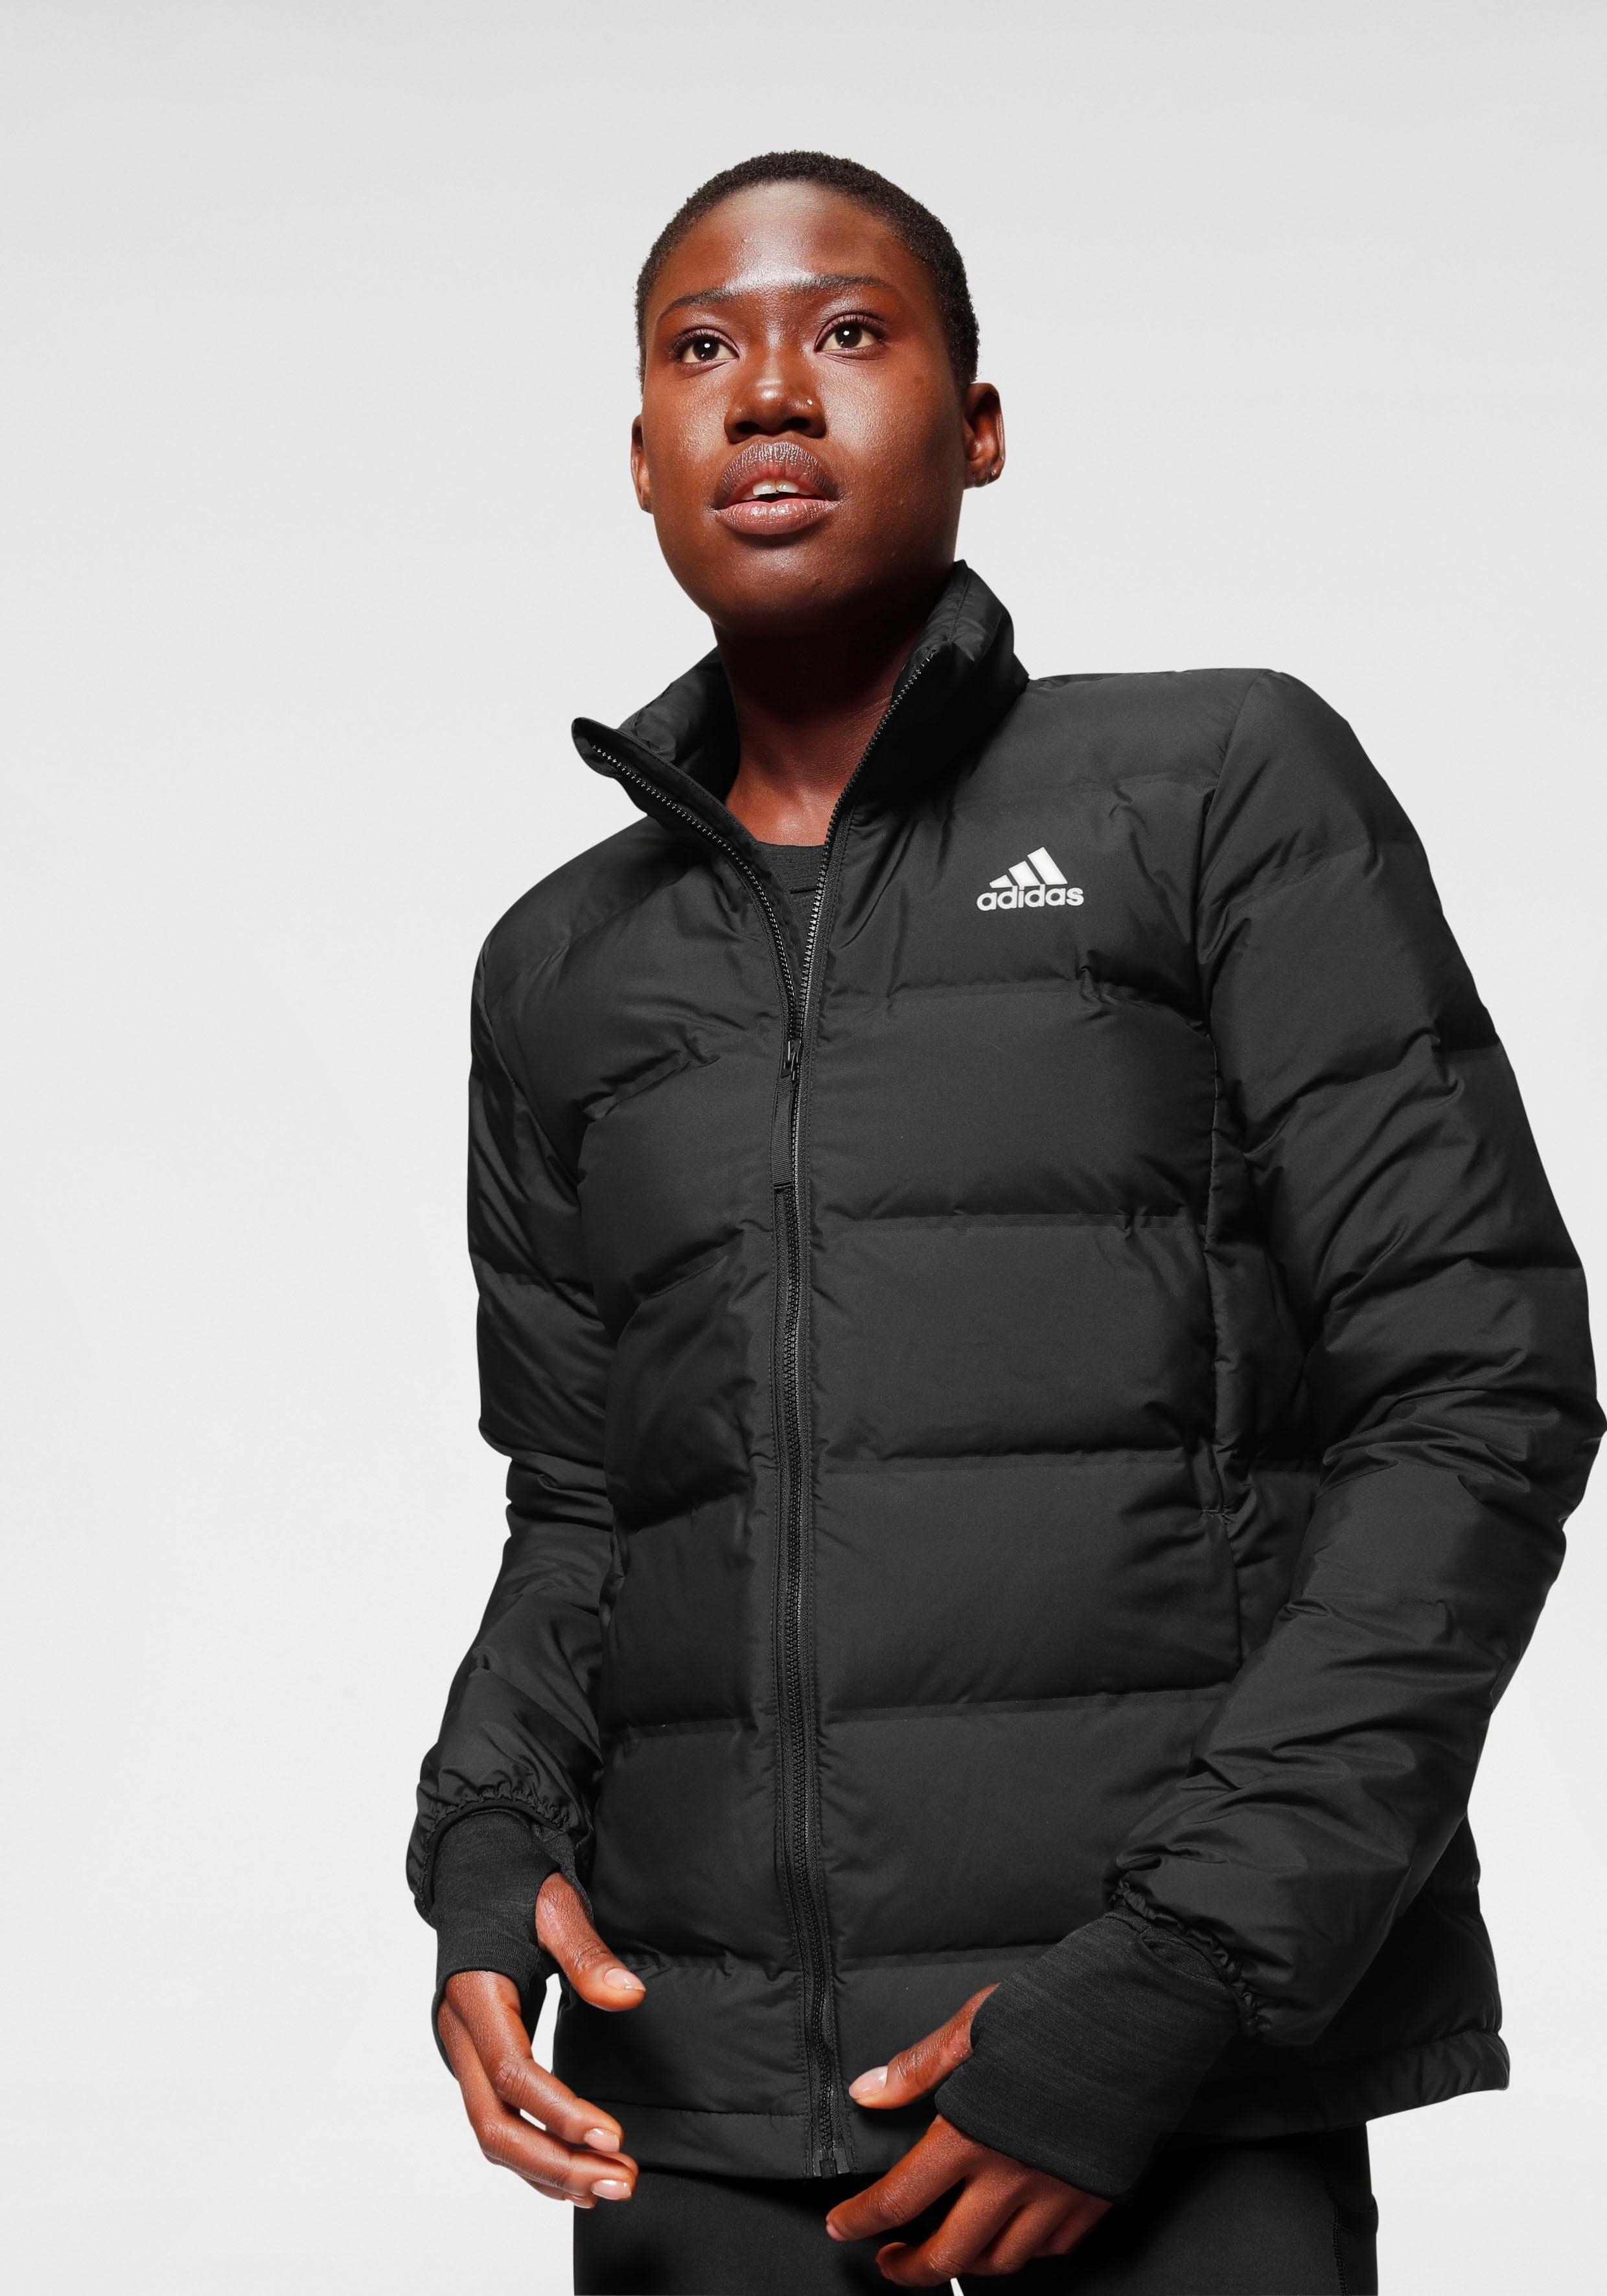 Adidas Helionic 3 Streifen Jacke Funktionsjacke Damen